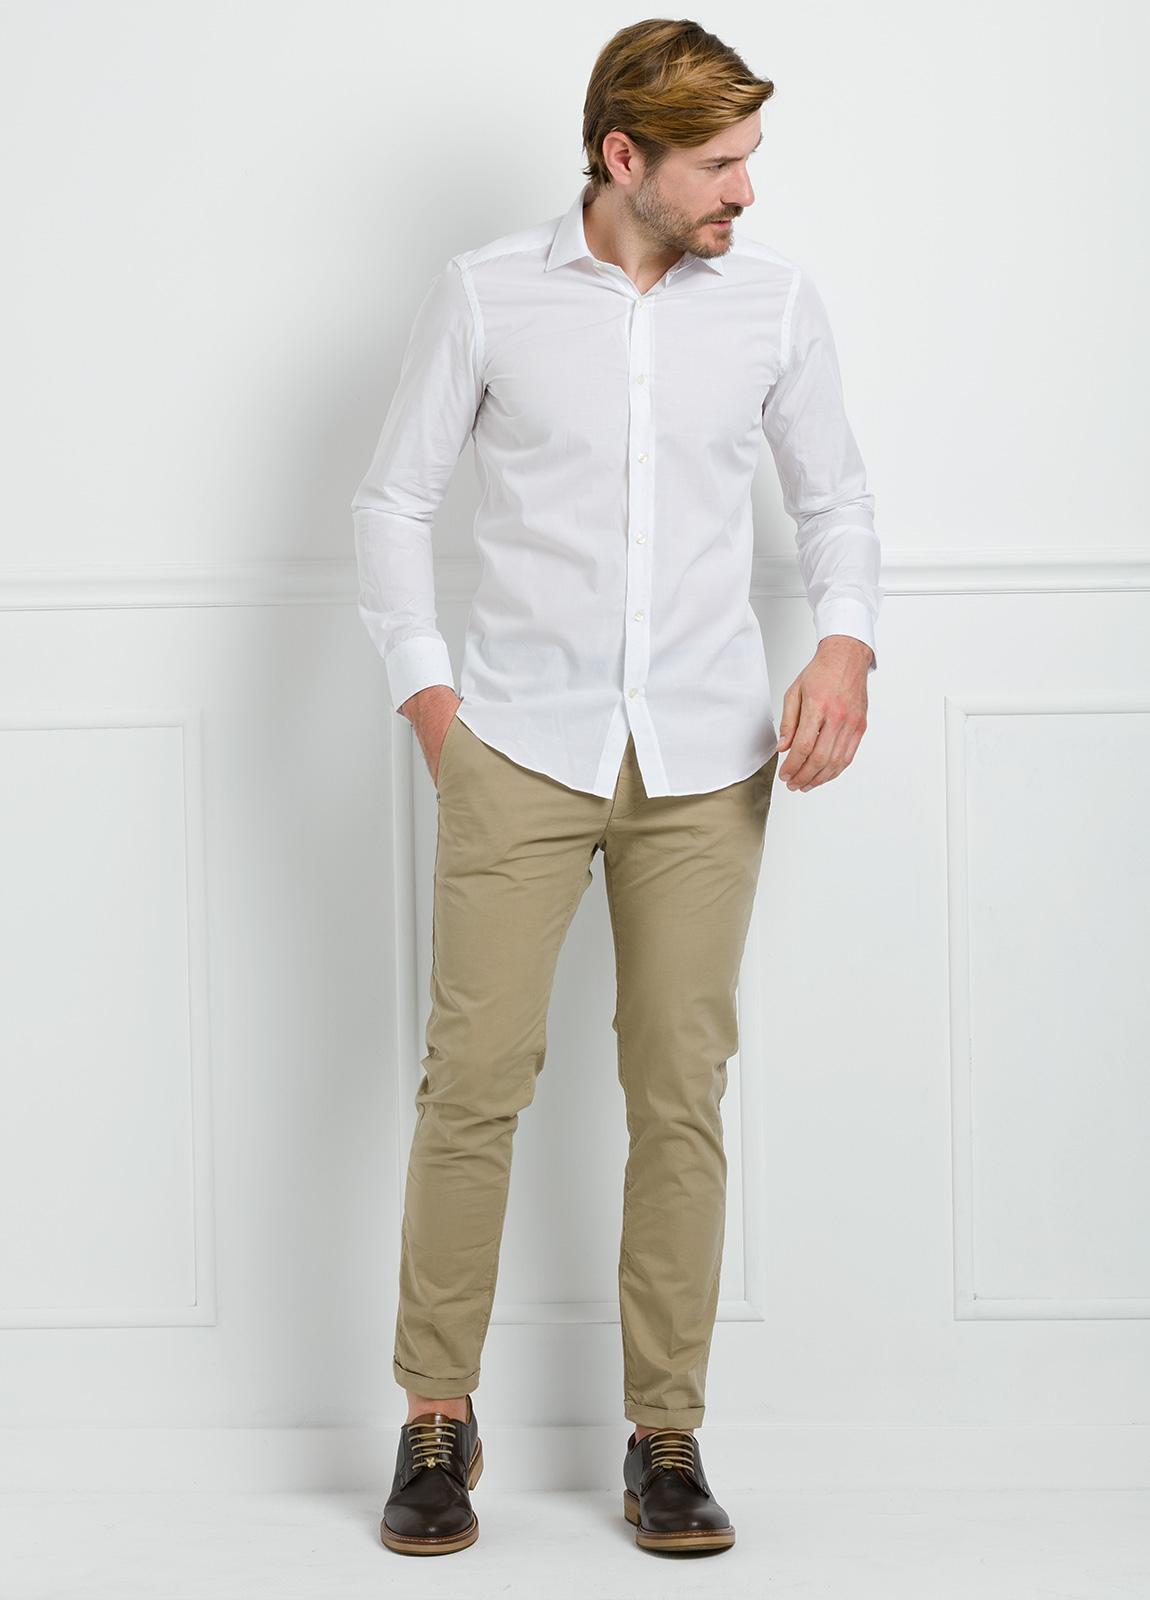 Camisa Formal Wear SLIM FIT cuello italiano modelo ROMA color blanco con micro dibujo color celeste. 100% Algodón. - Ítem3